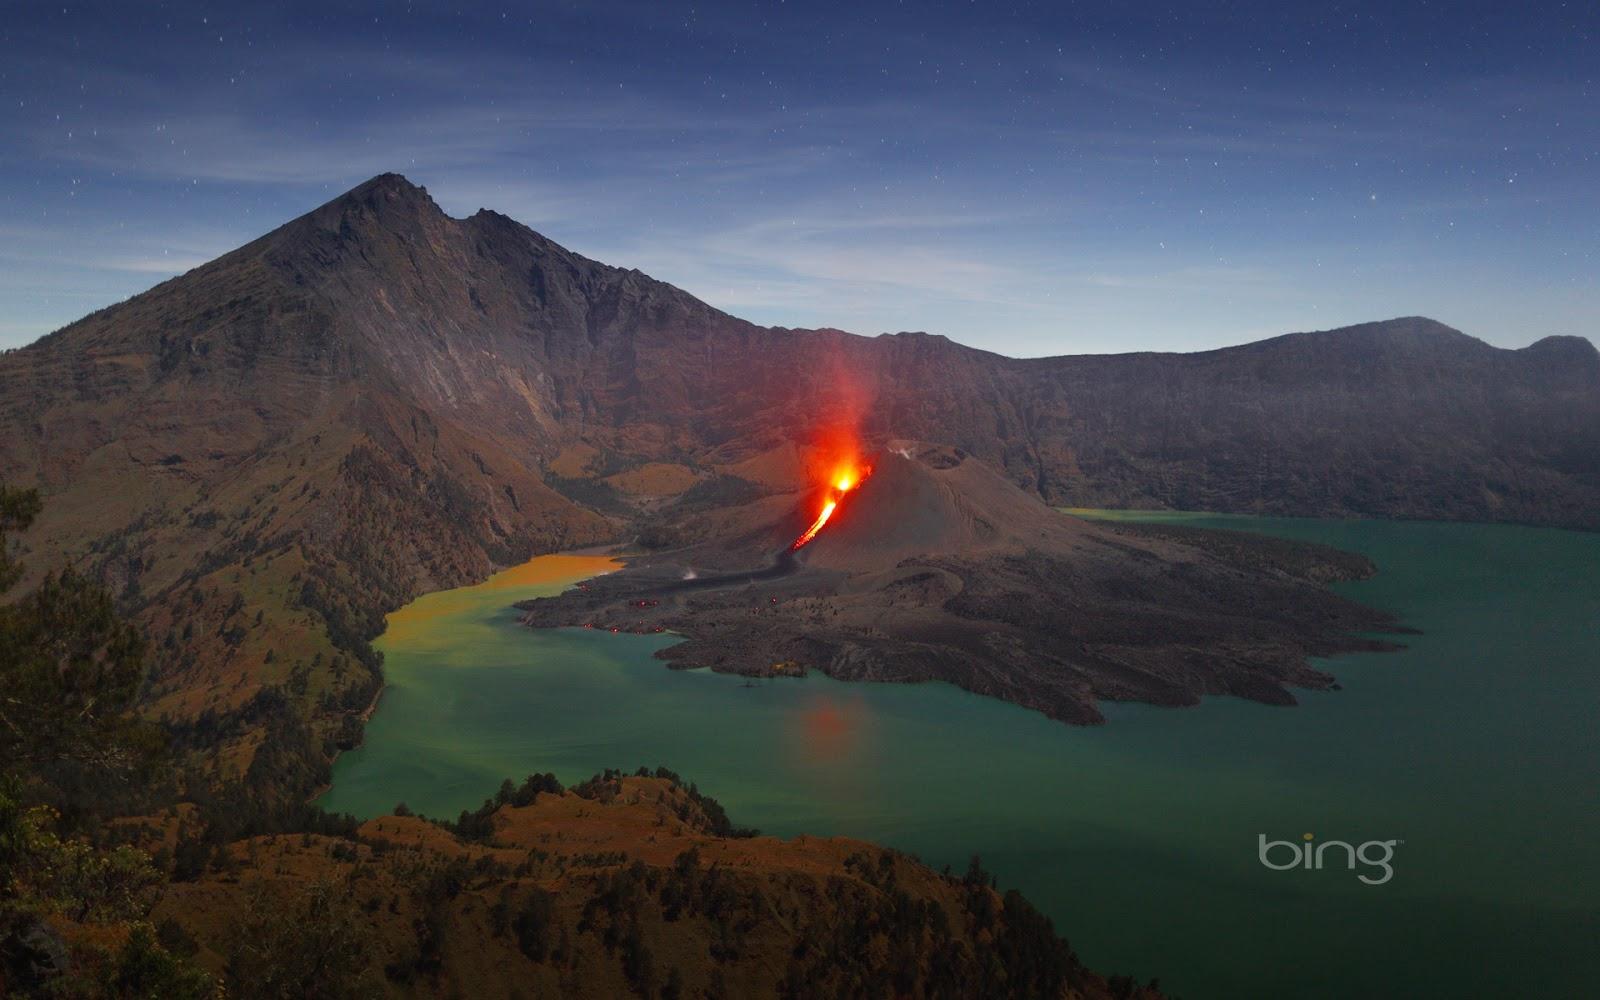 Mount Rinjani Lombok Indonesia Martin RietzeCorbis 1600x1000